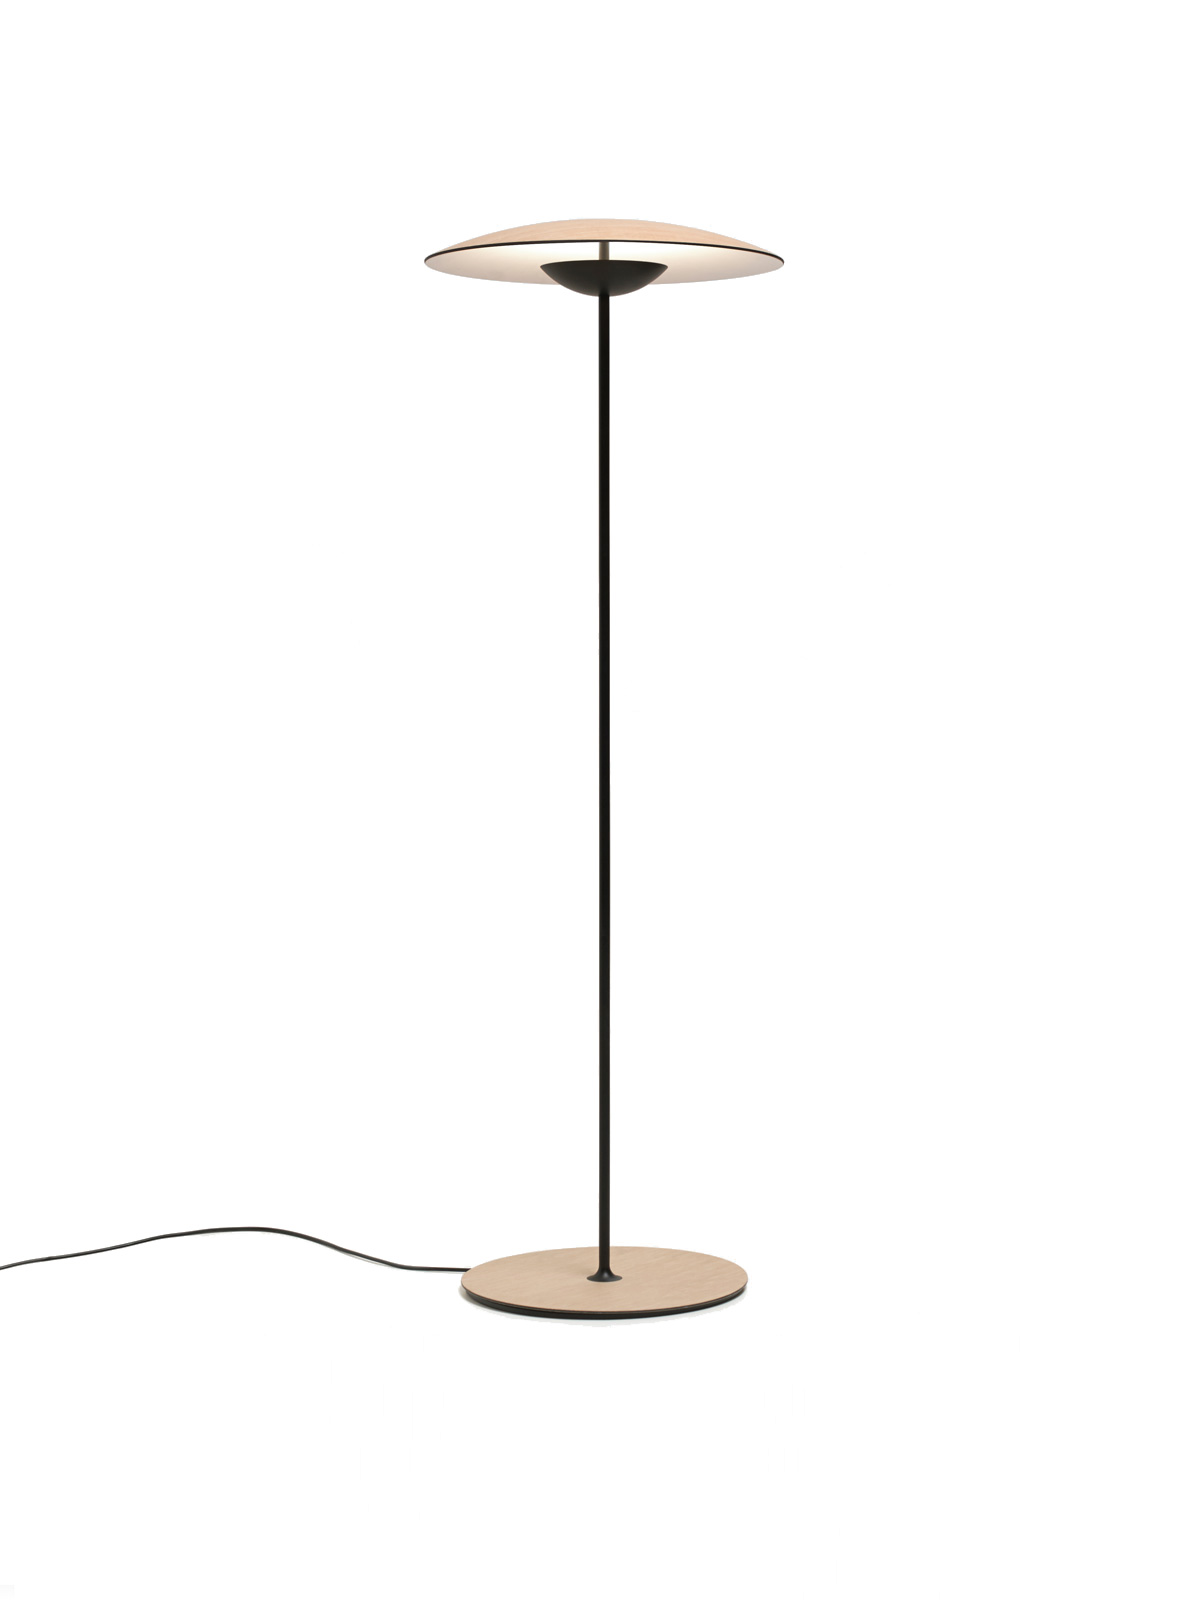 GINGER P - Lampen Leuchten Designerleuchten Online Berlin Design